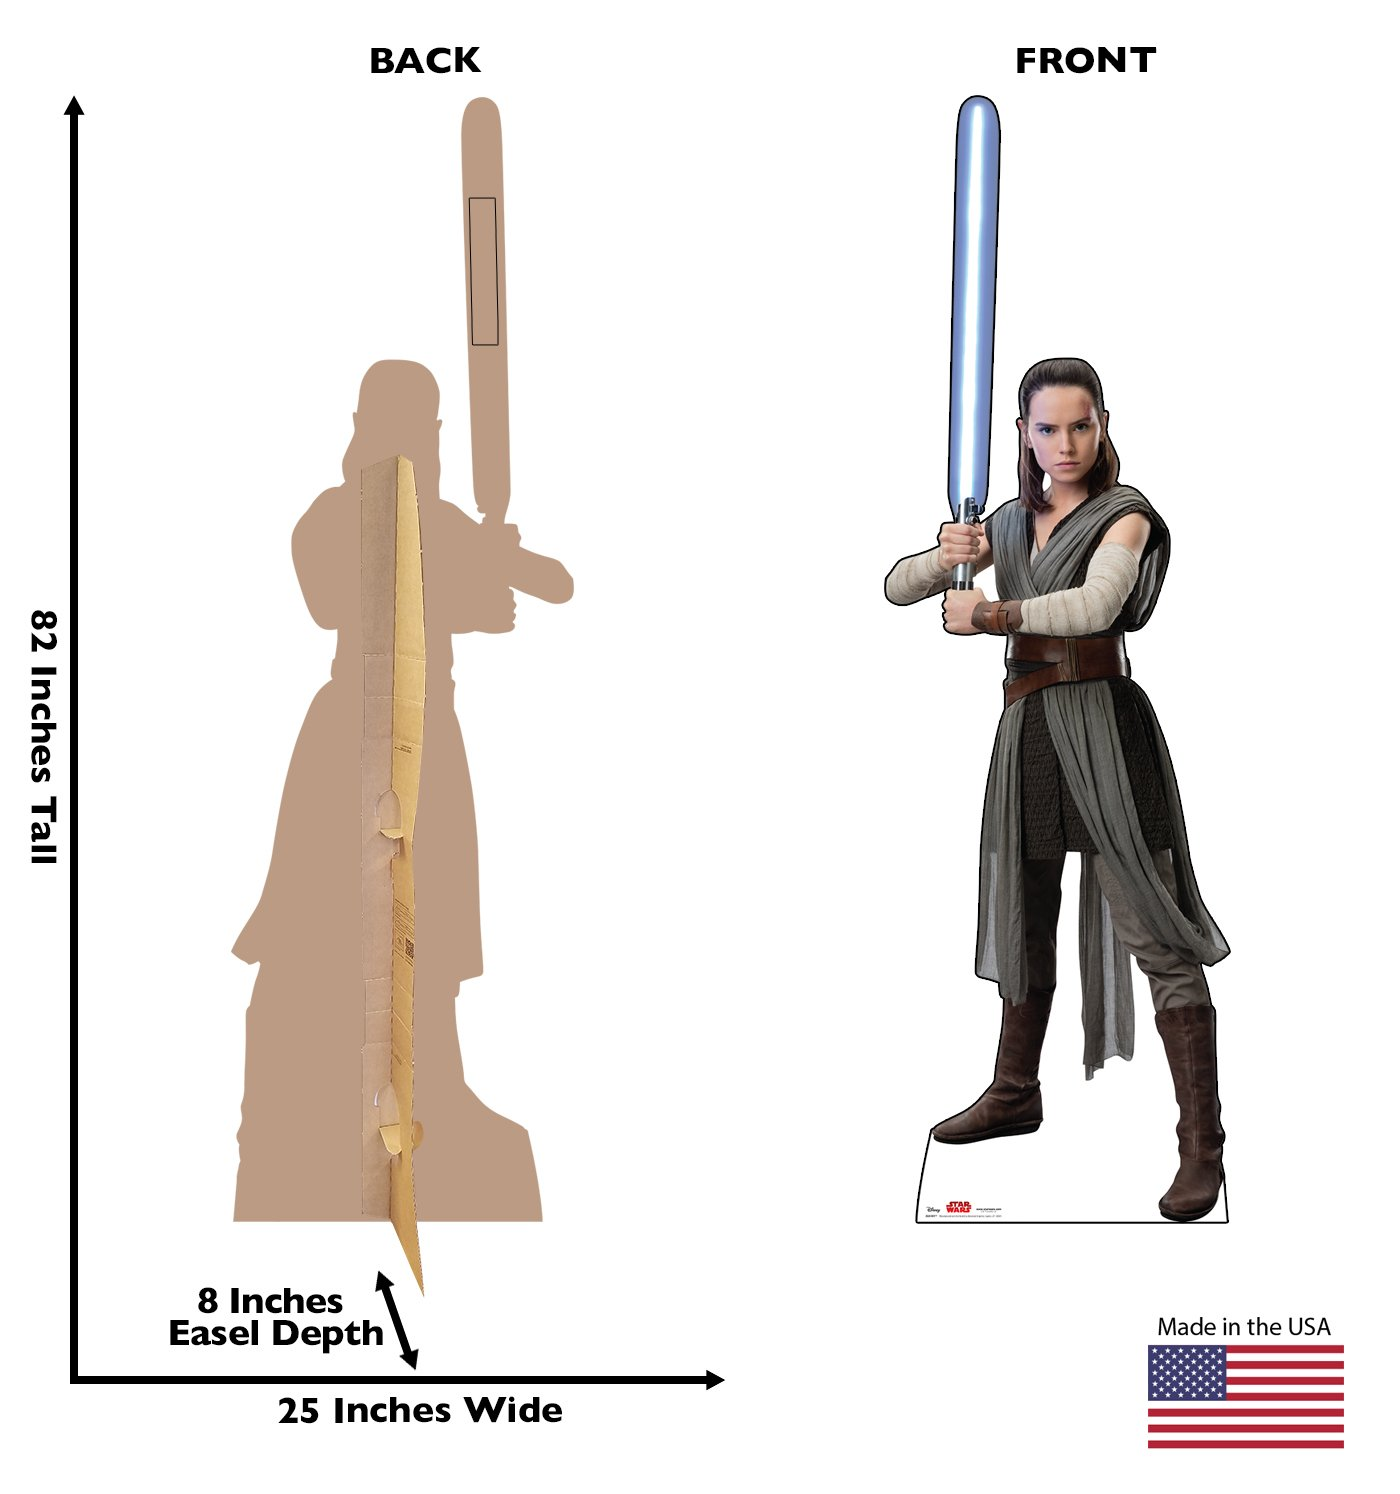 The Last Jedi 2541 Star Wars: Episode VIII Advanced Graphics Chewbacca Life Size Cardboard Cutout Standup 2017 Film